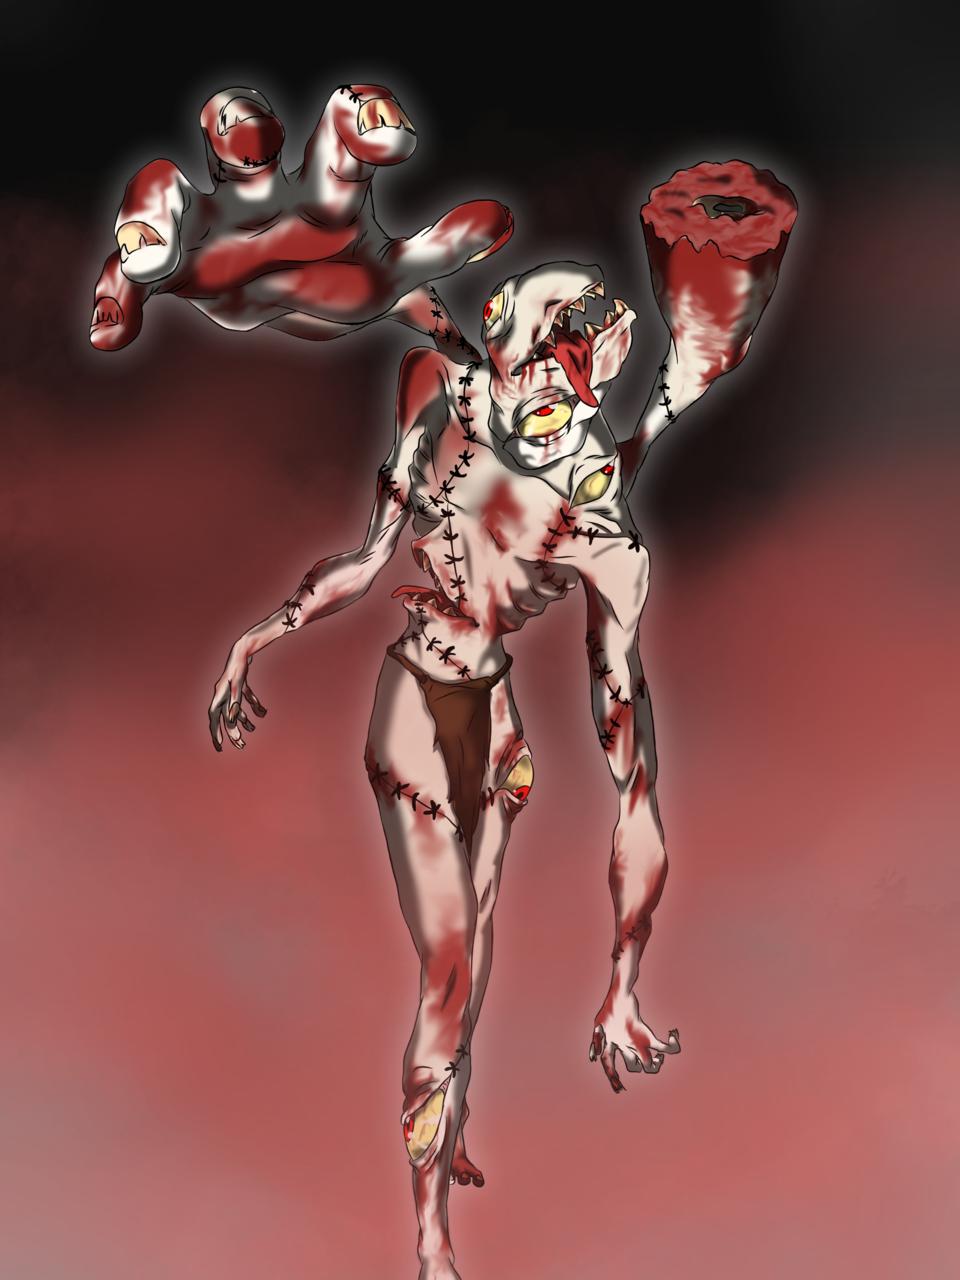 Craving Illust of Alcides Maker ML-JDL August2020_Contest:Horror medibangpaint